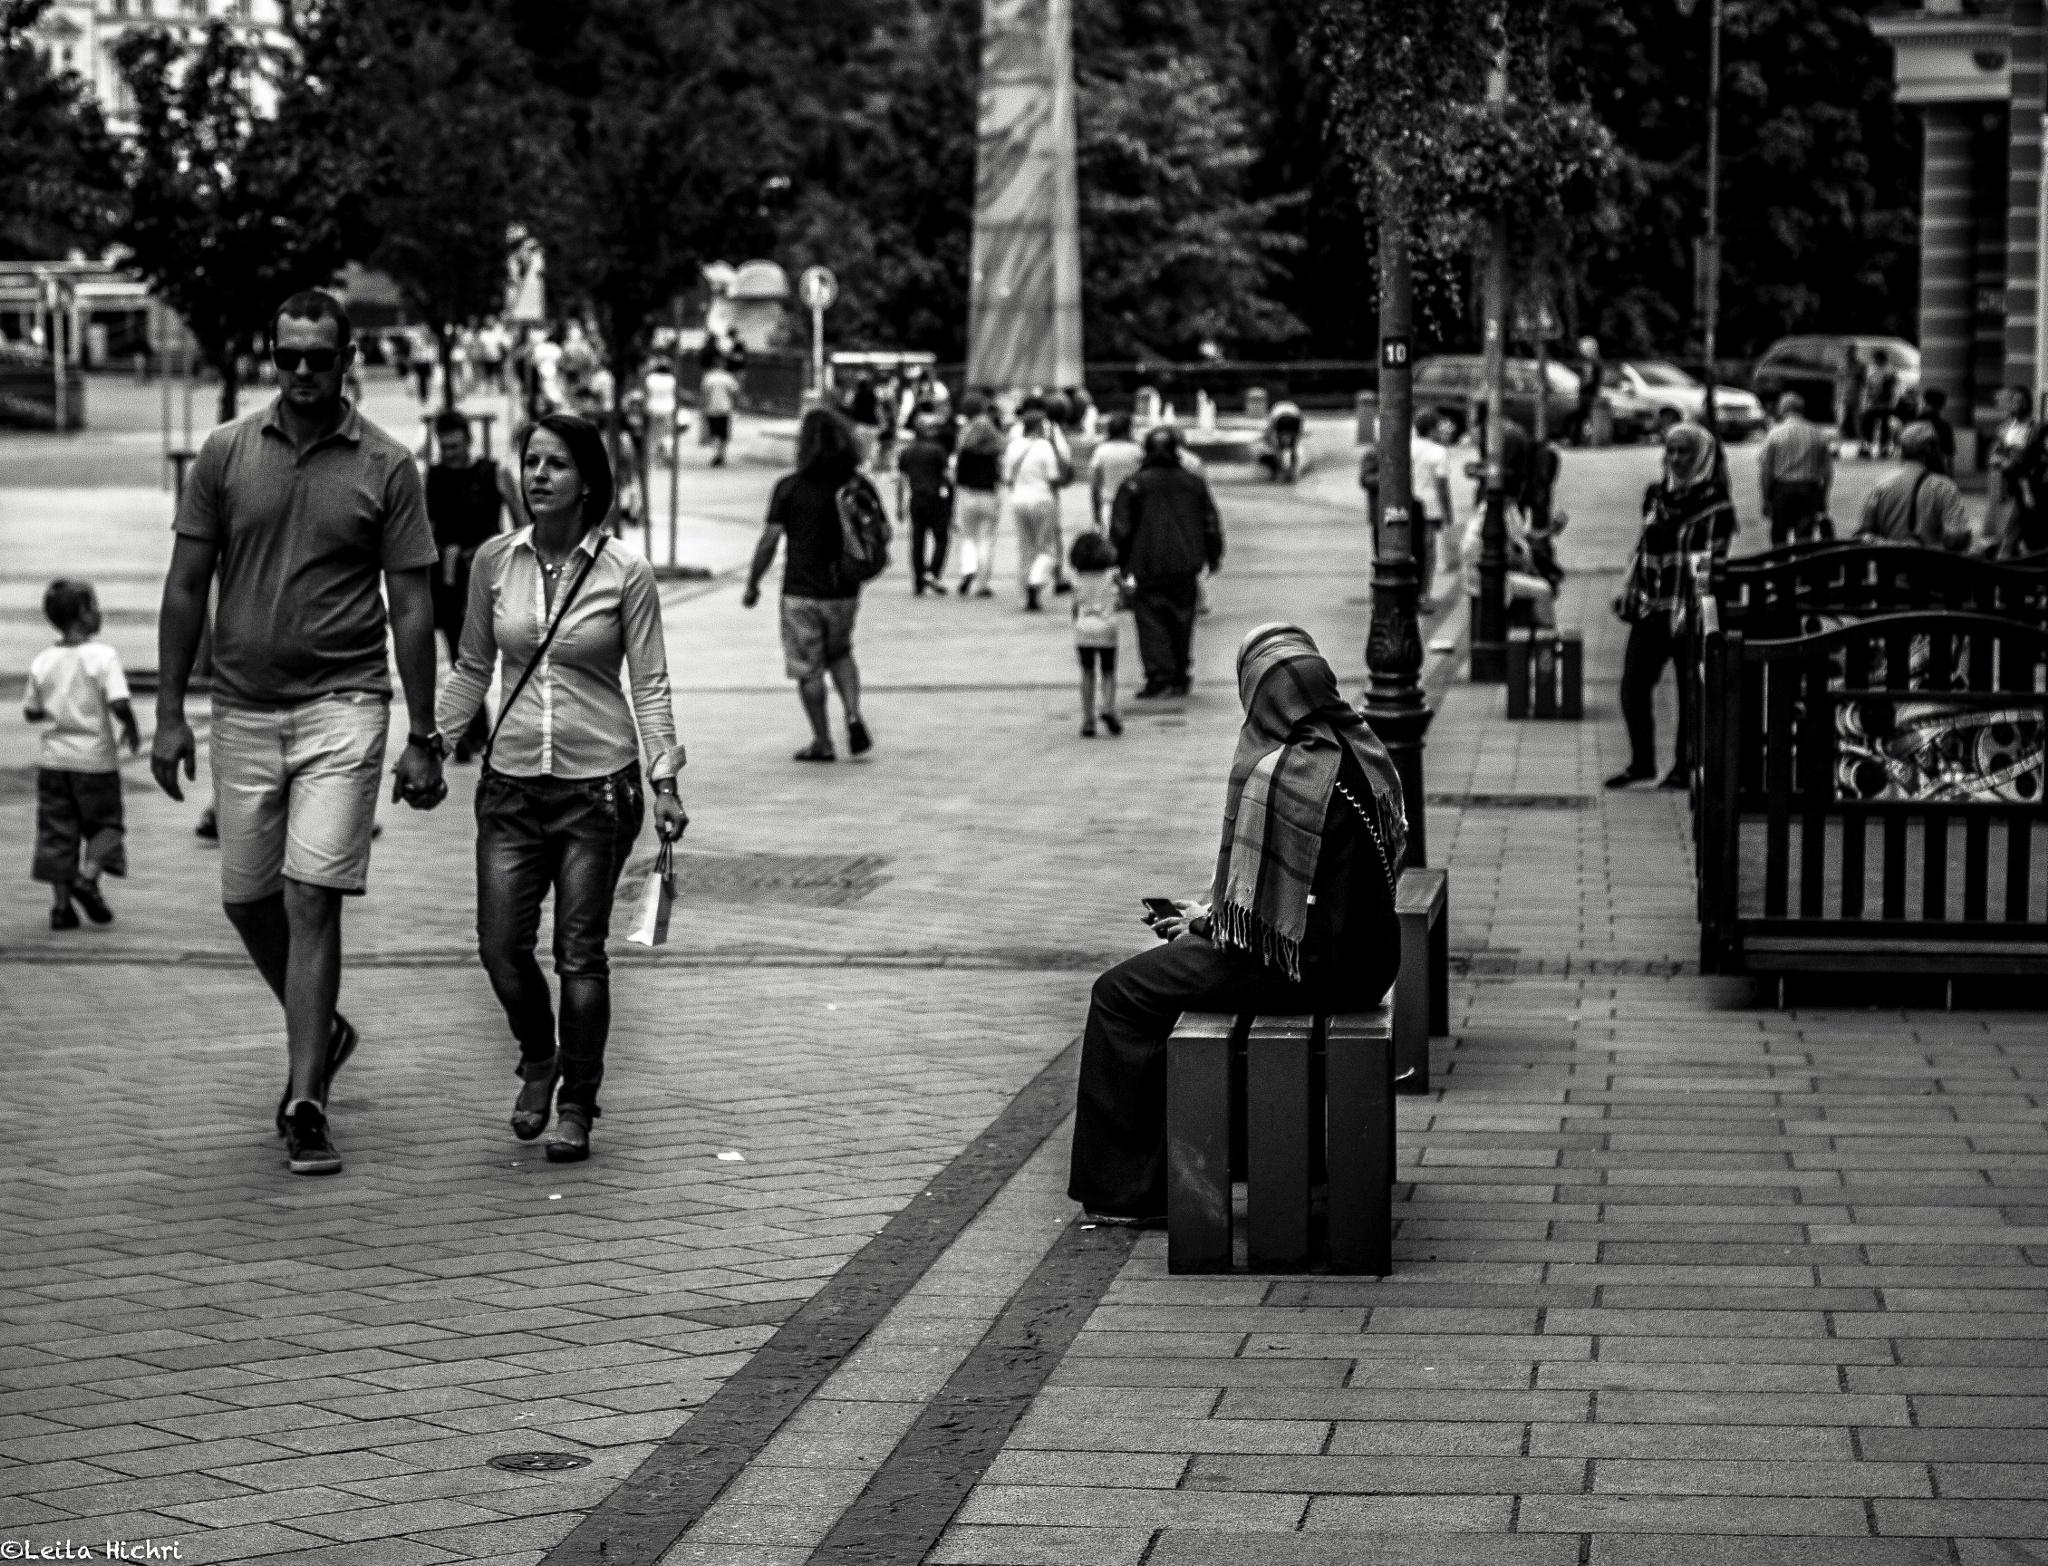 Society by Leila Hichri